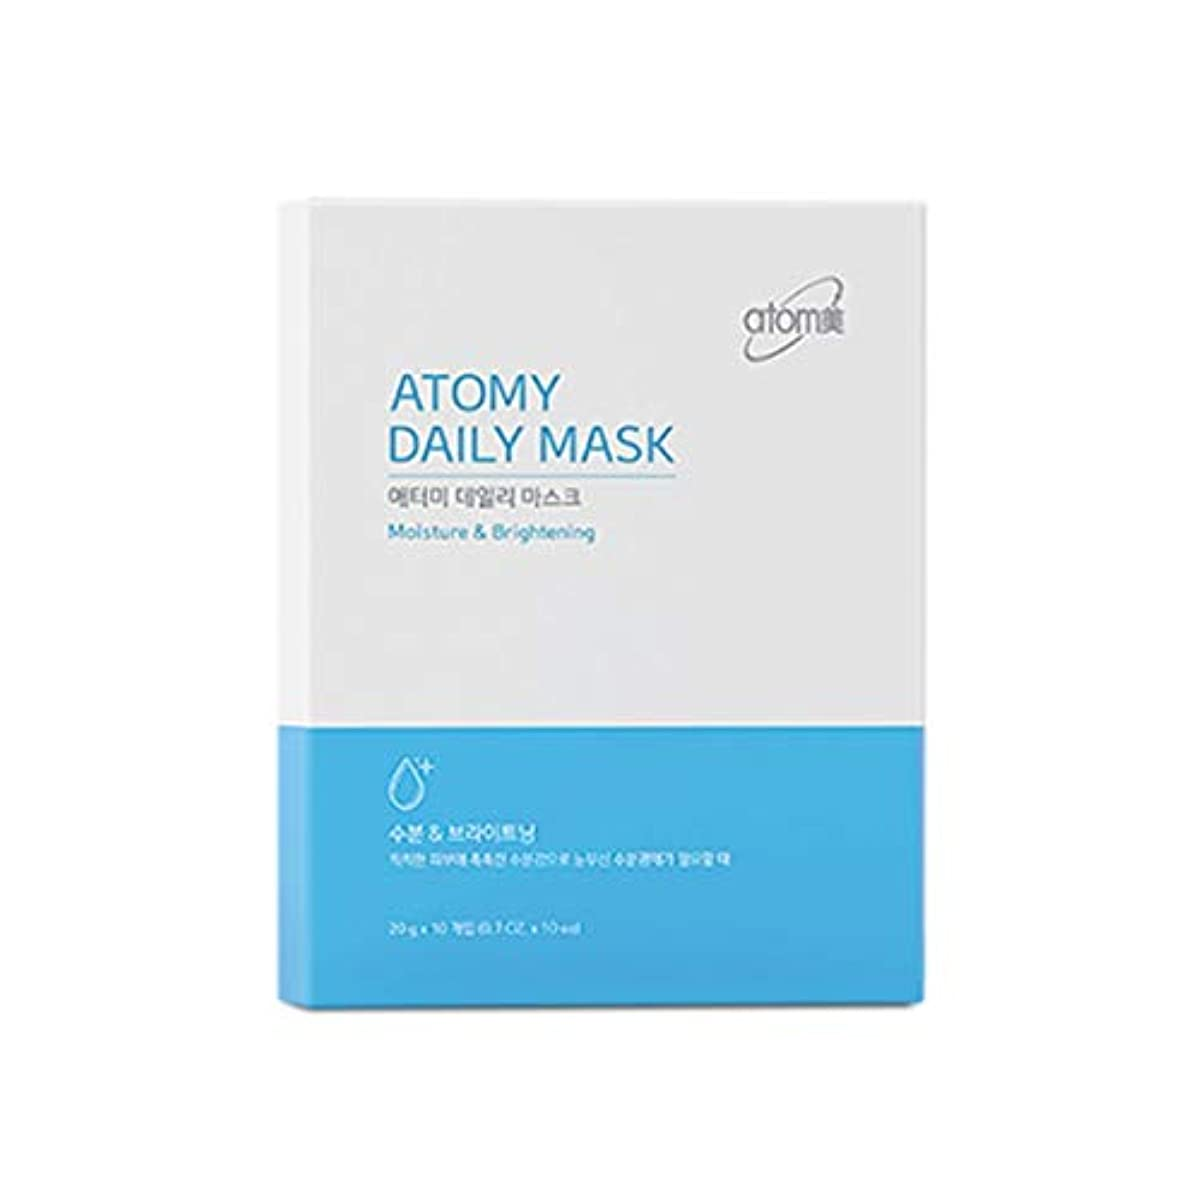 [NEW] Atomy Daily Mask Sheet 10 Pack- Moisture & Brightening アトミ 自然由来の成分と4つの特許成分マスクパック(並行輸入品)